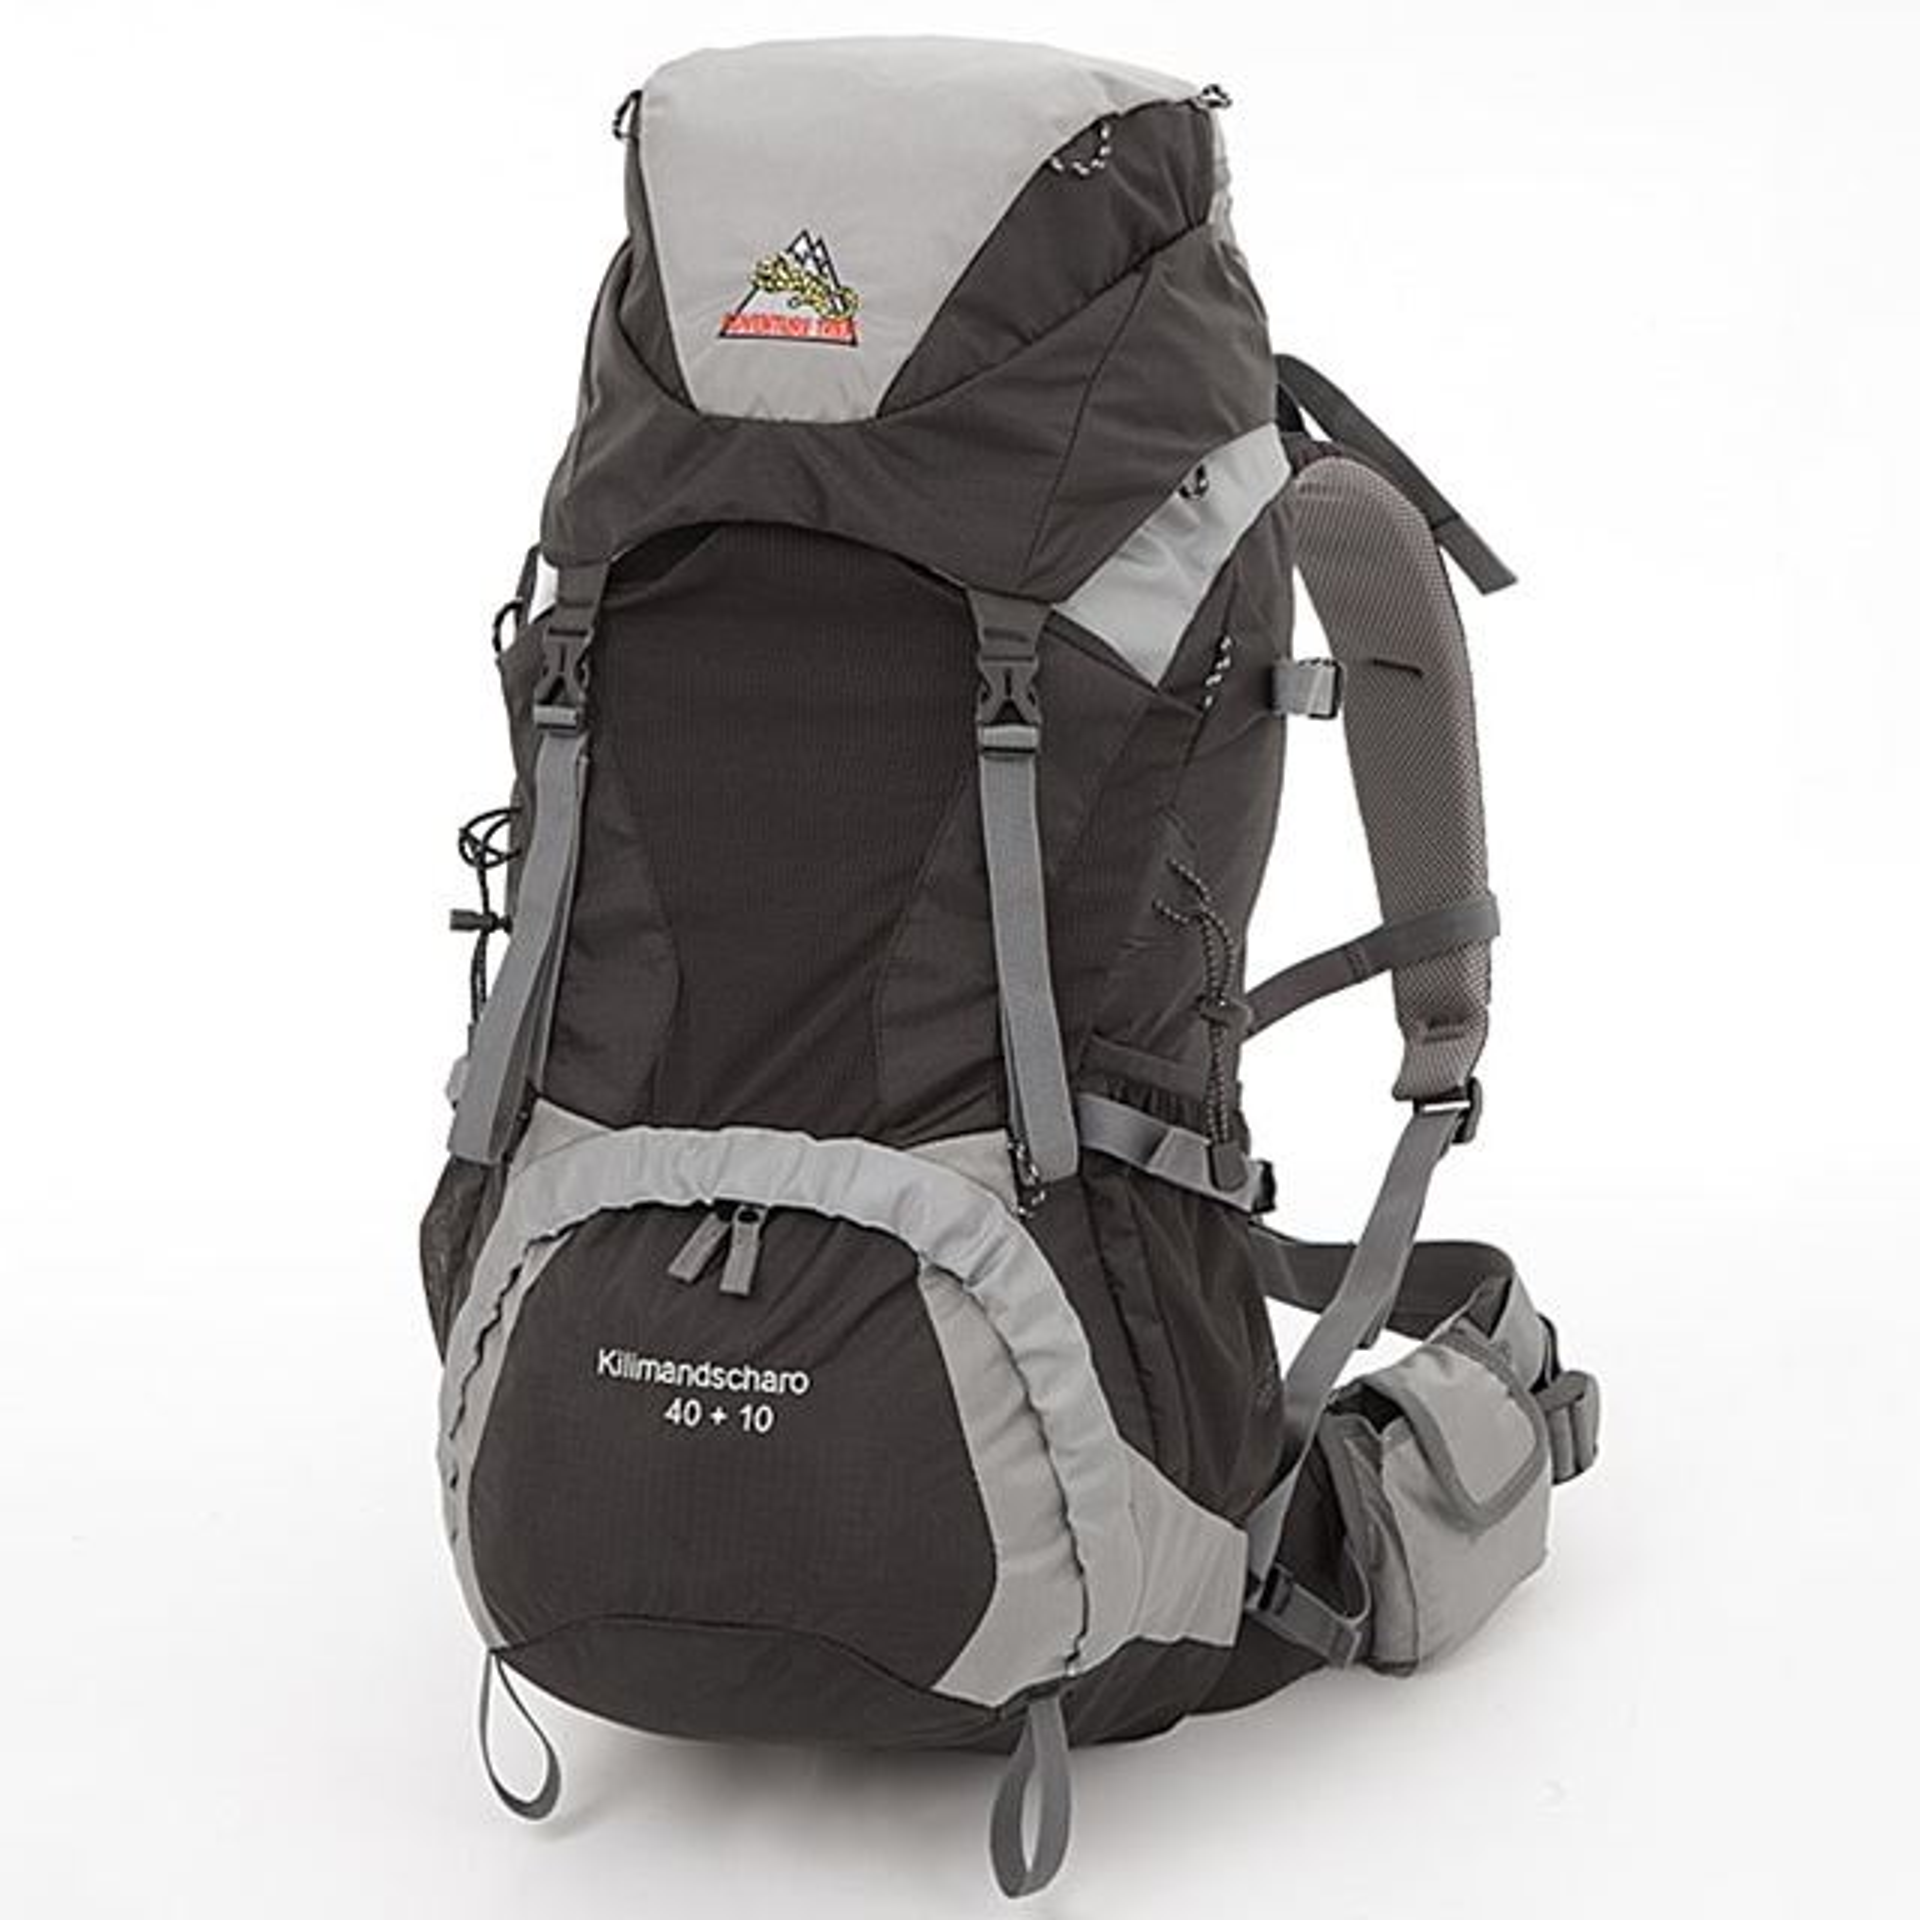 Rucksack Kilimandscharo 40 + 10 L